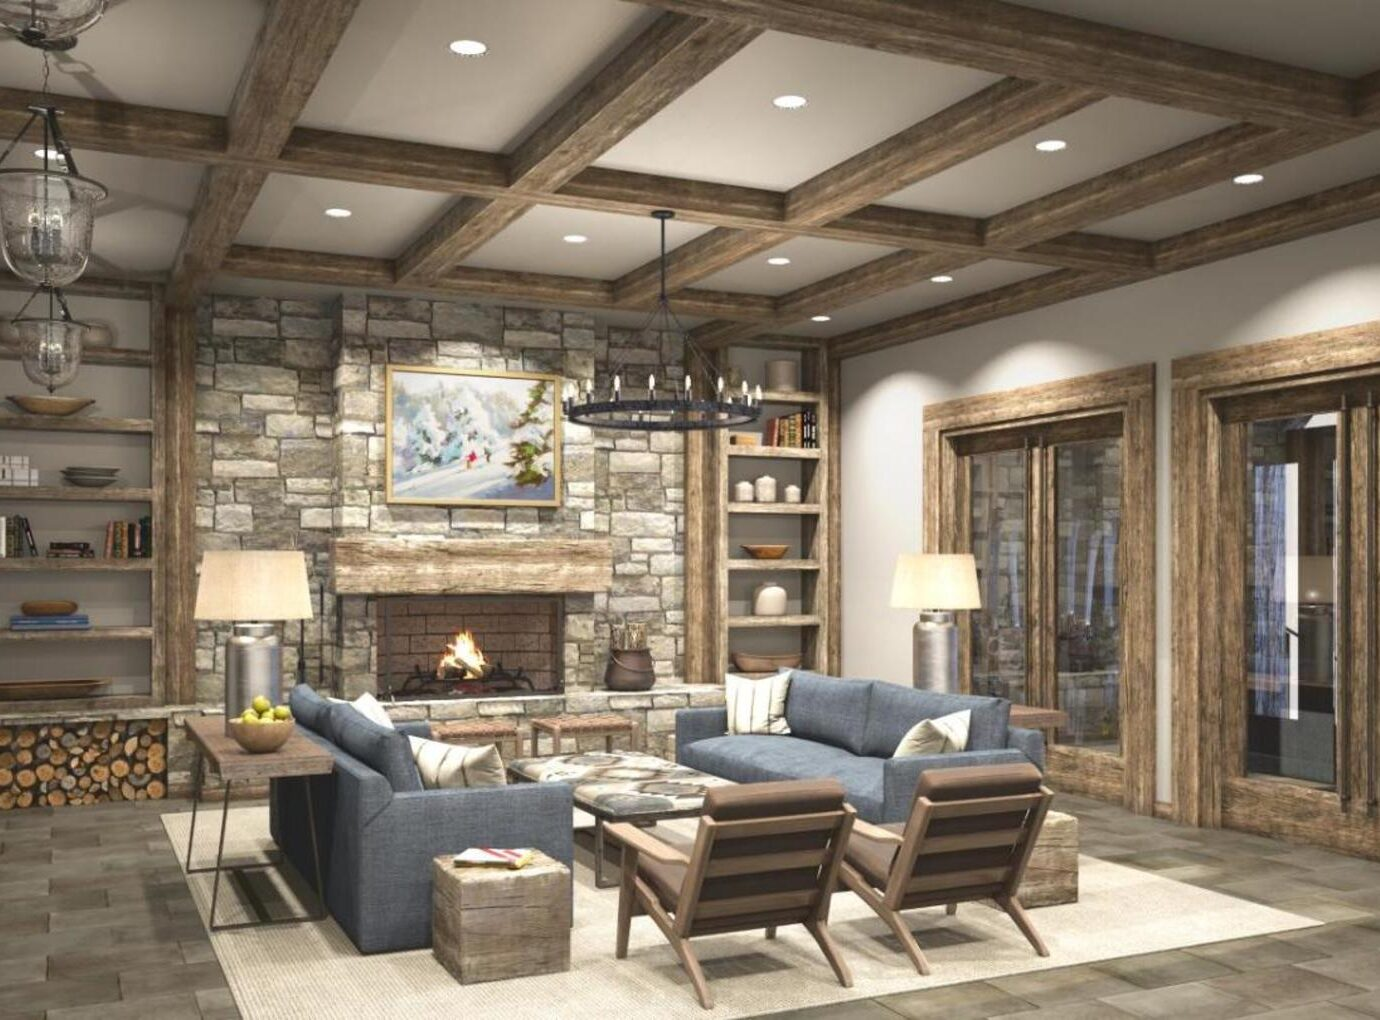 Lounge at Snowpine Lodge, Alta, UT